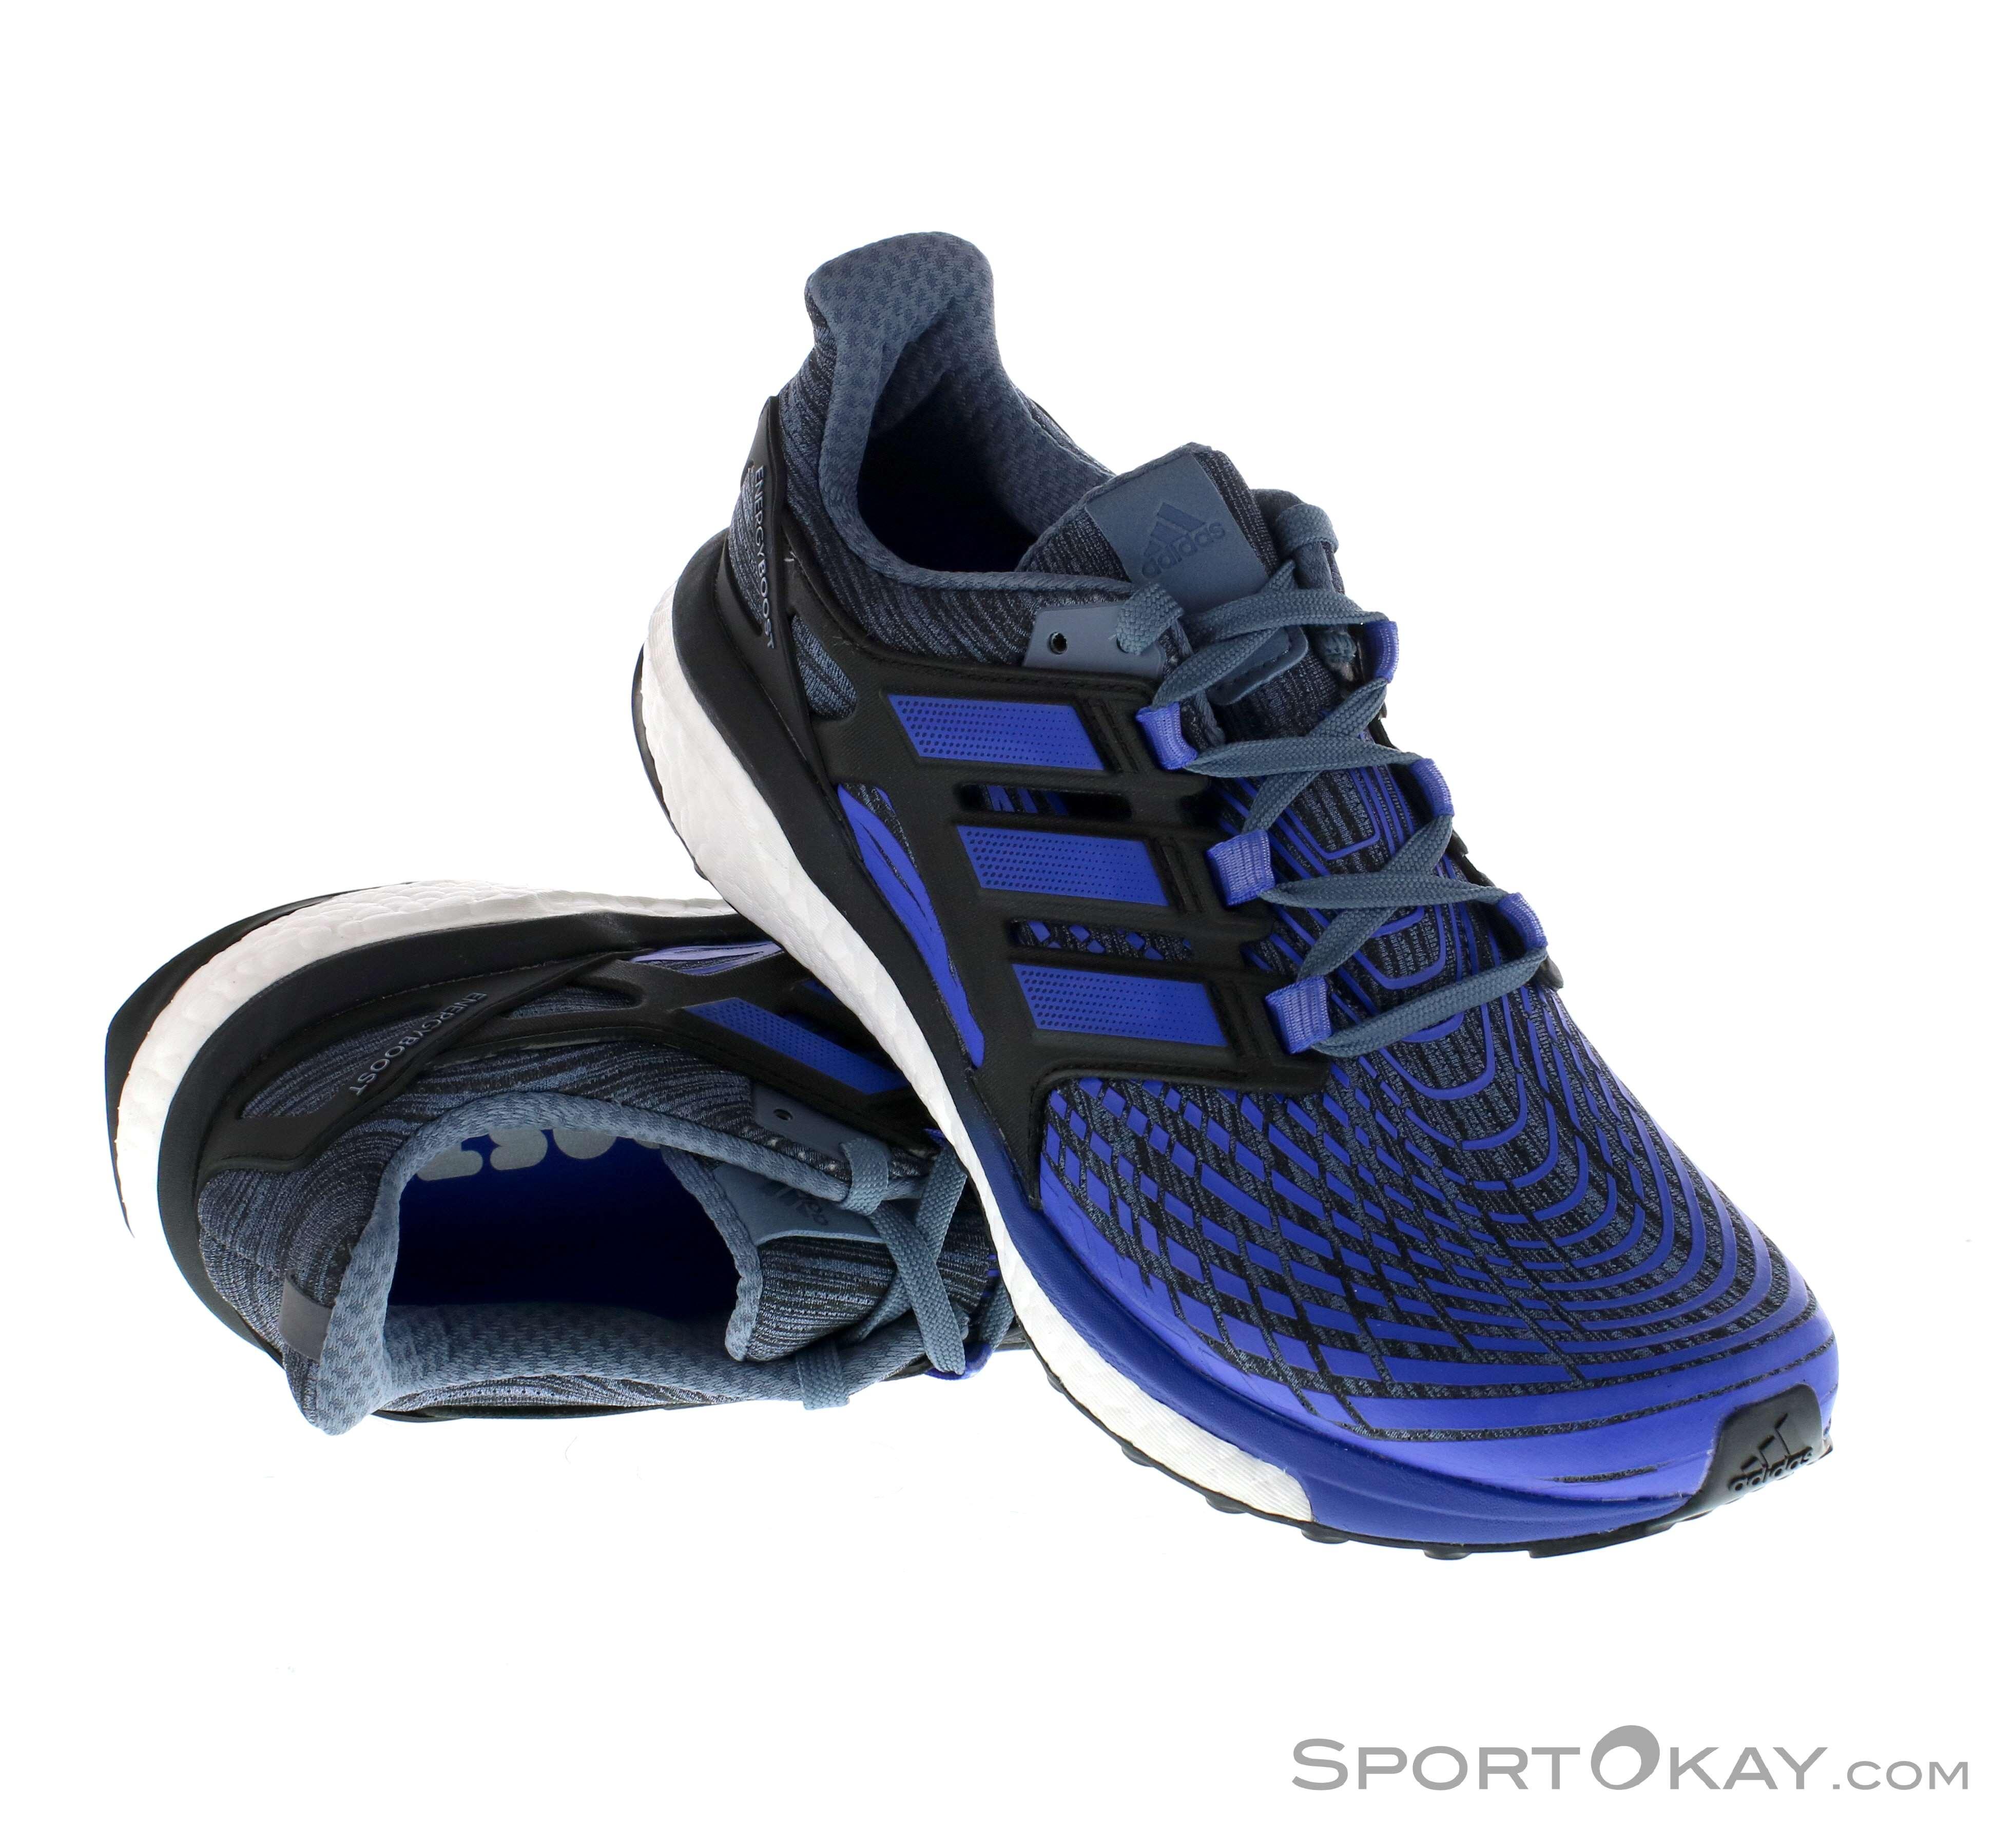 quality design 7f3f5 91150 adidas Energy Boost Uomo Scarpe da Corsa , adidas, Nero, , Uomo, 0002